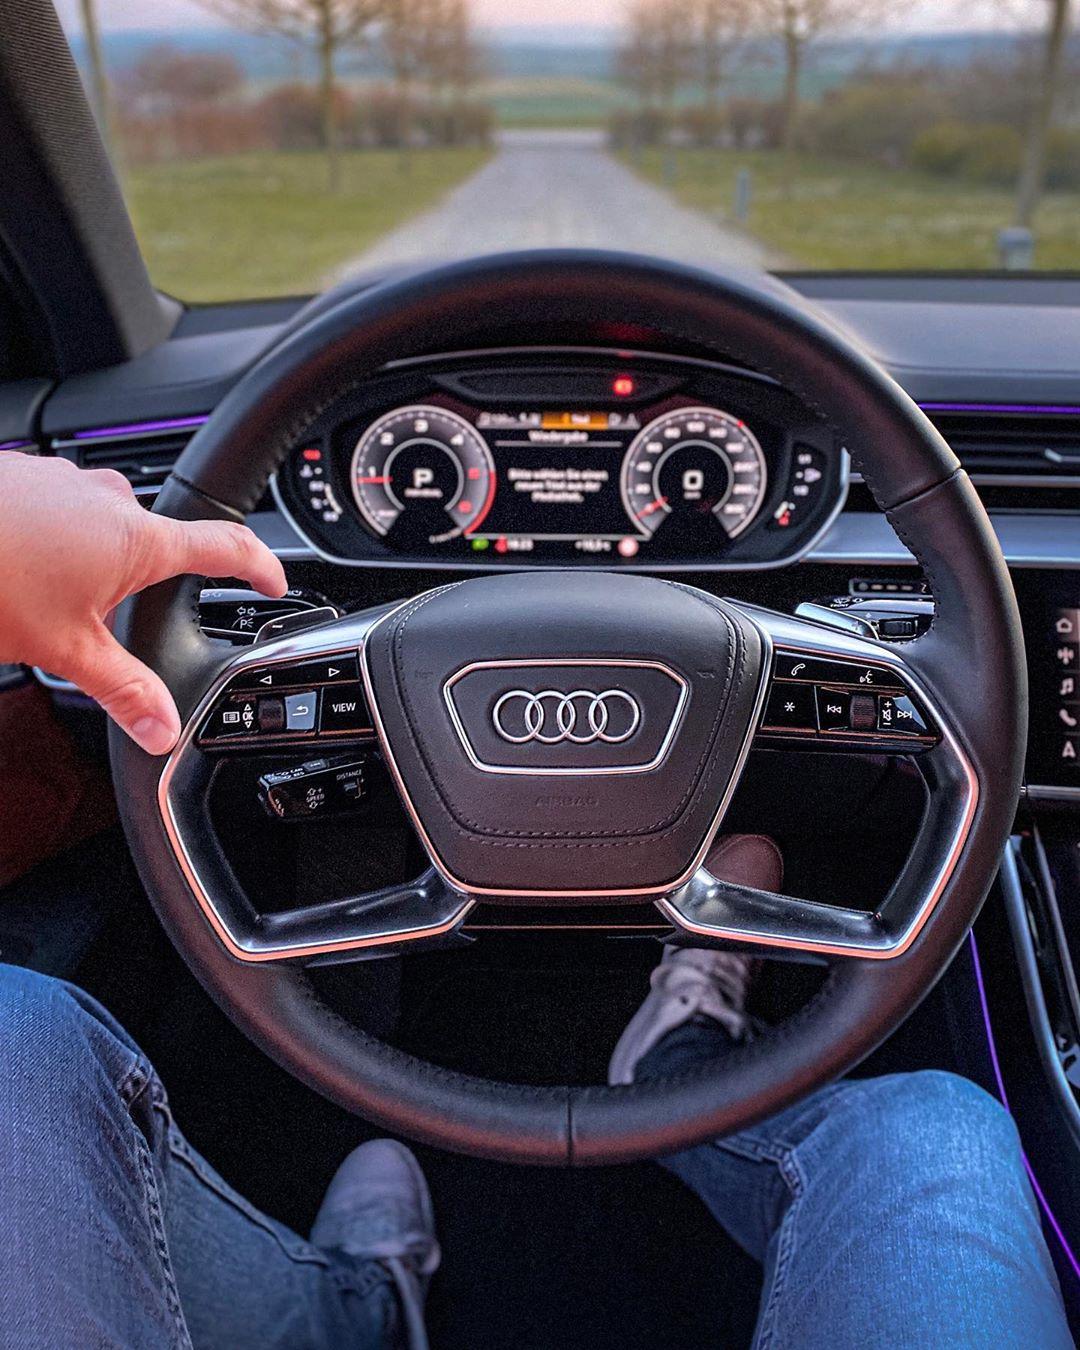 Back in our Flagship💫🙏 #audia8 #a850tdi #audiluxury #luxury #audiexclusive #a8l #a8 #automanntv #automannsgarage #audi